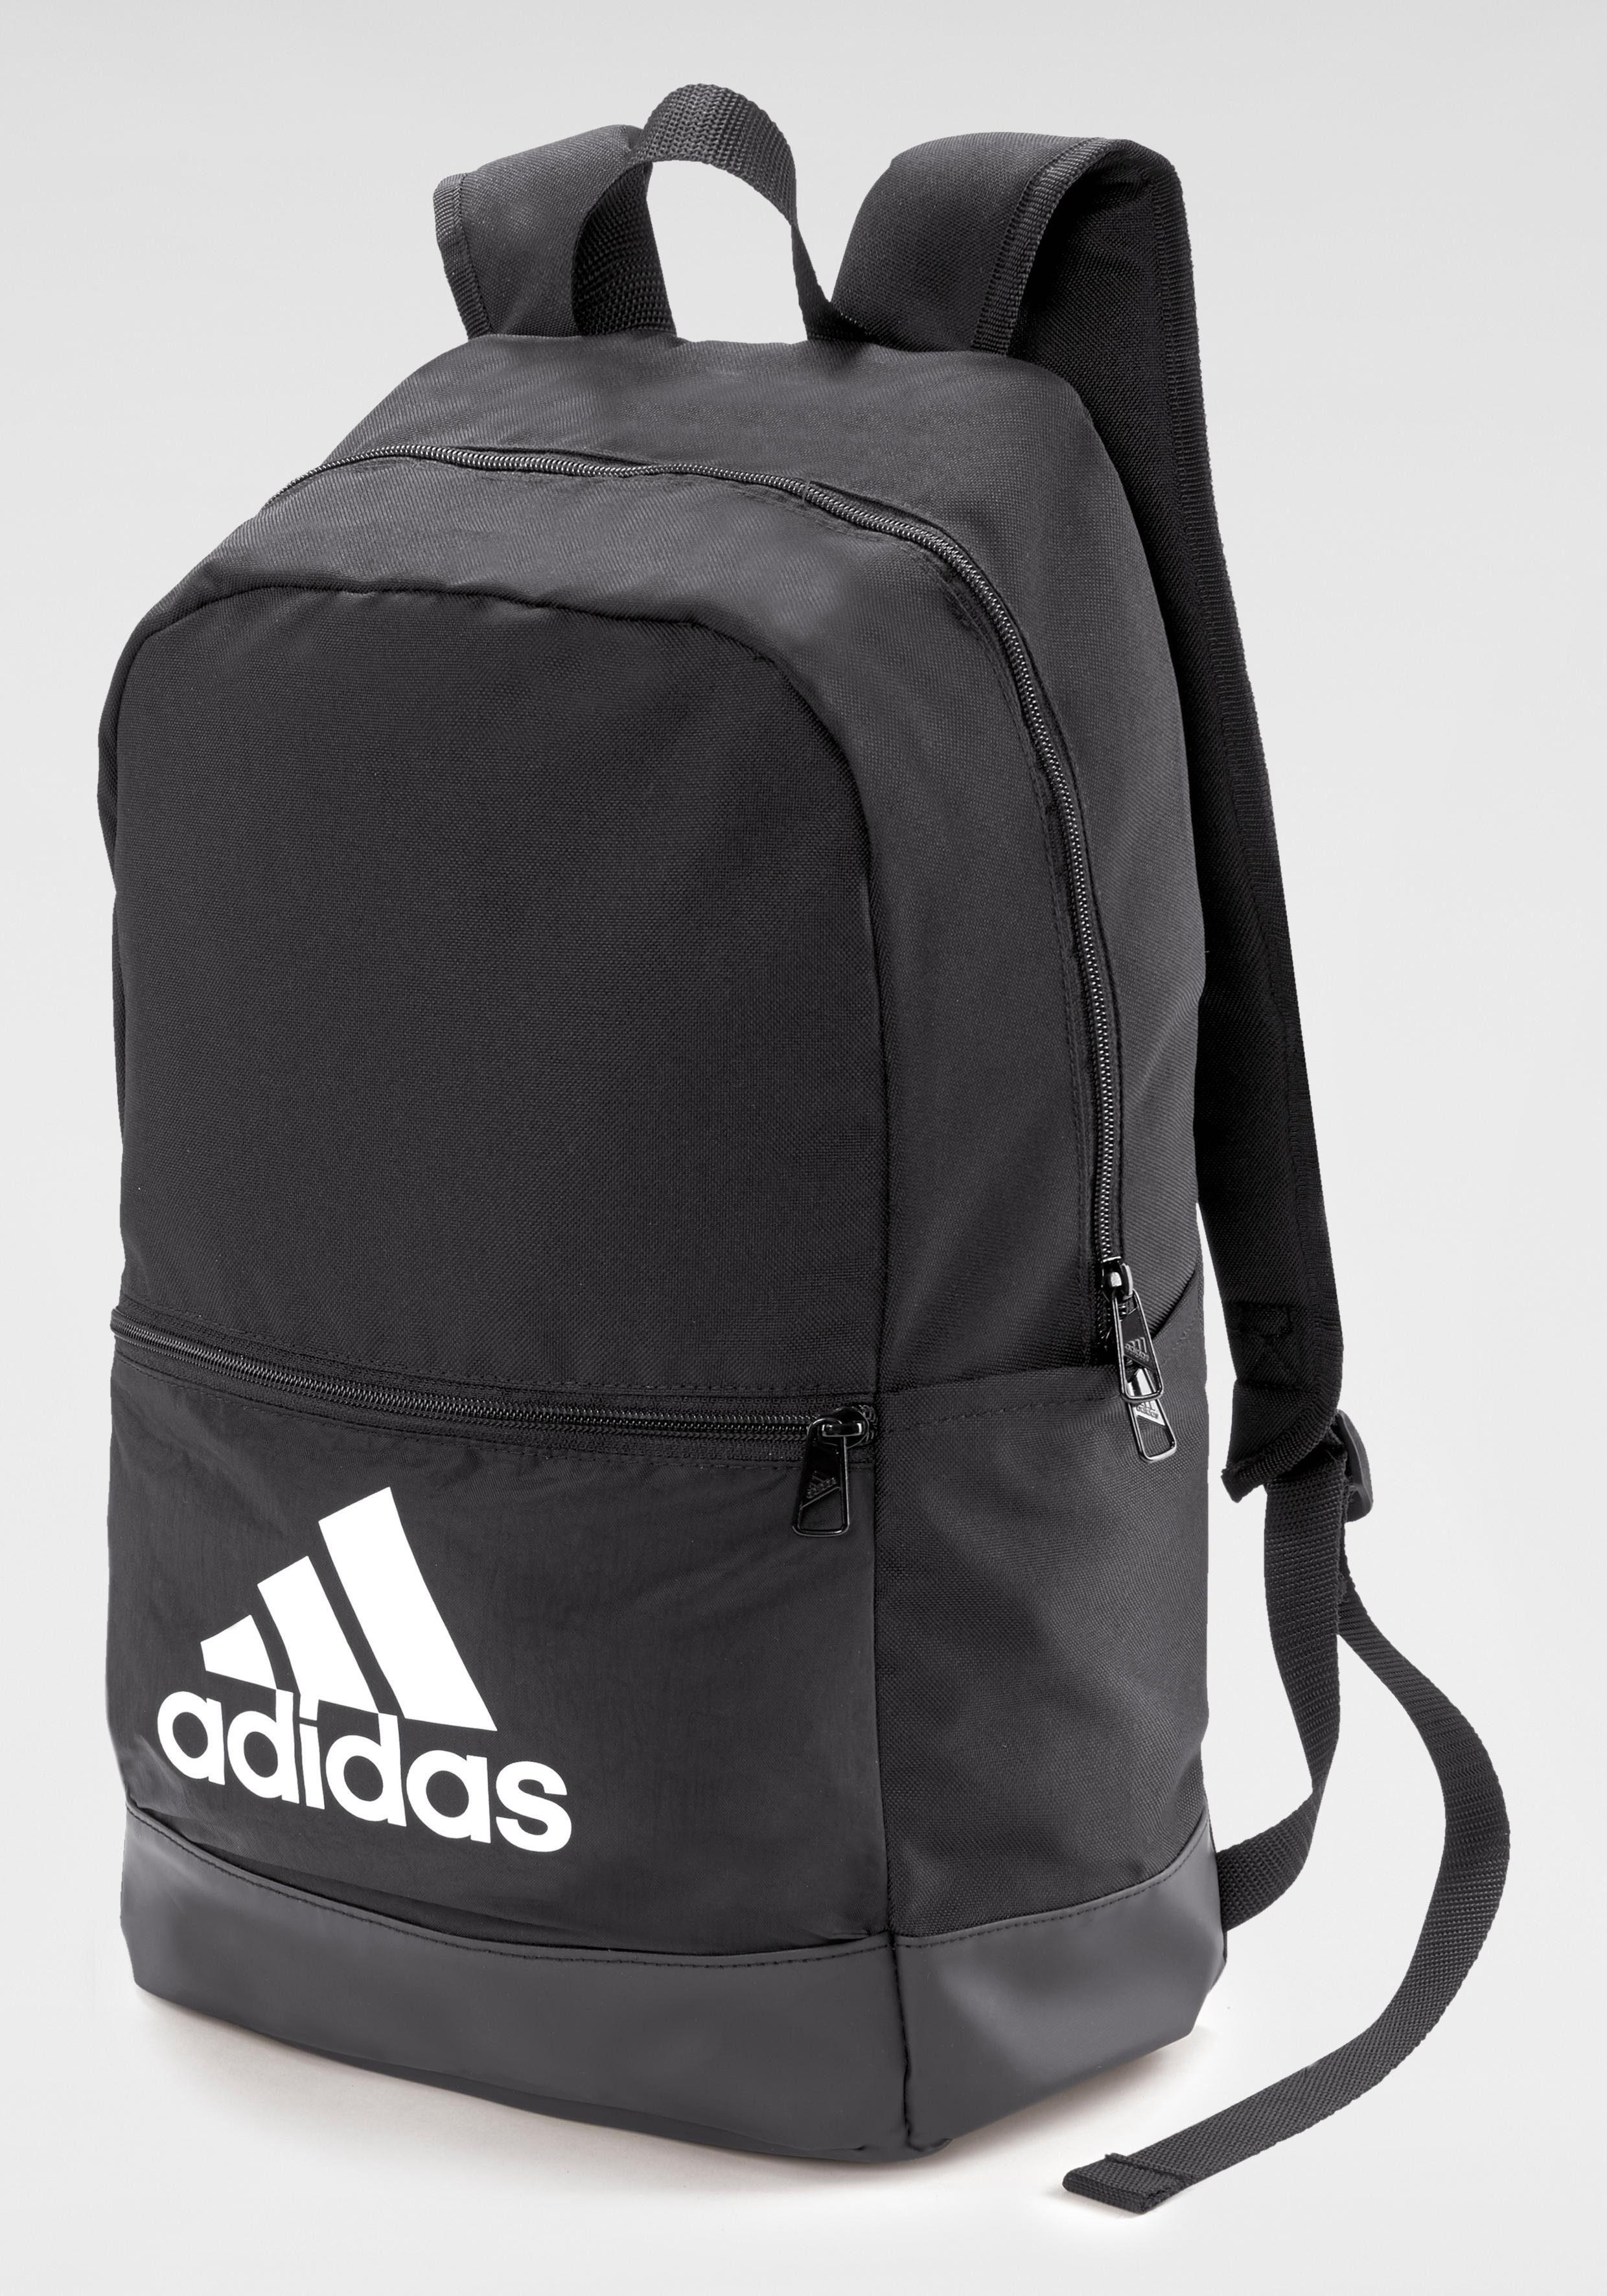 adidas Performance Sportrucksack »CLAS BACKPACK BATCH OF SPORTS« online kaufen | OTTO